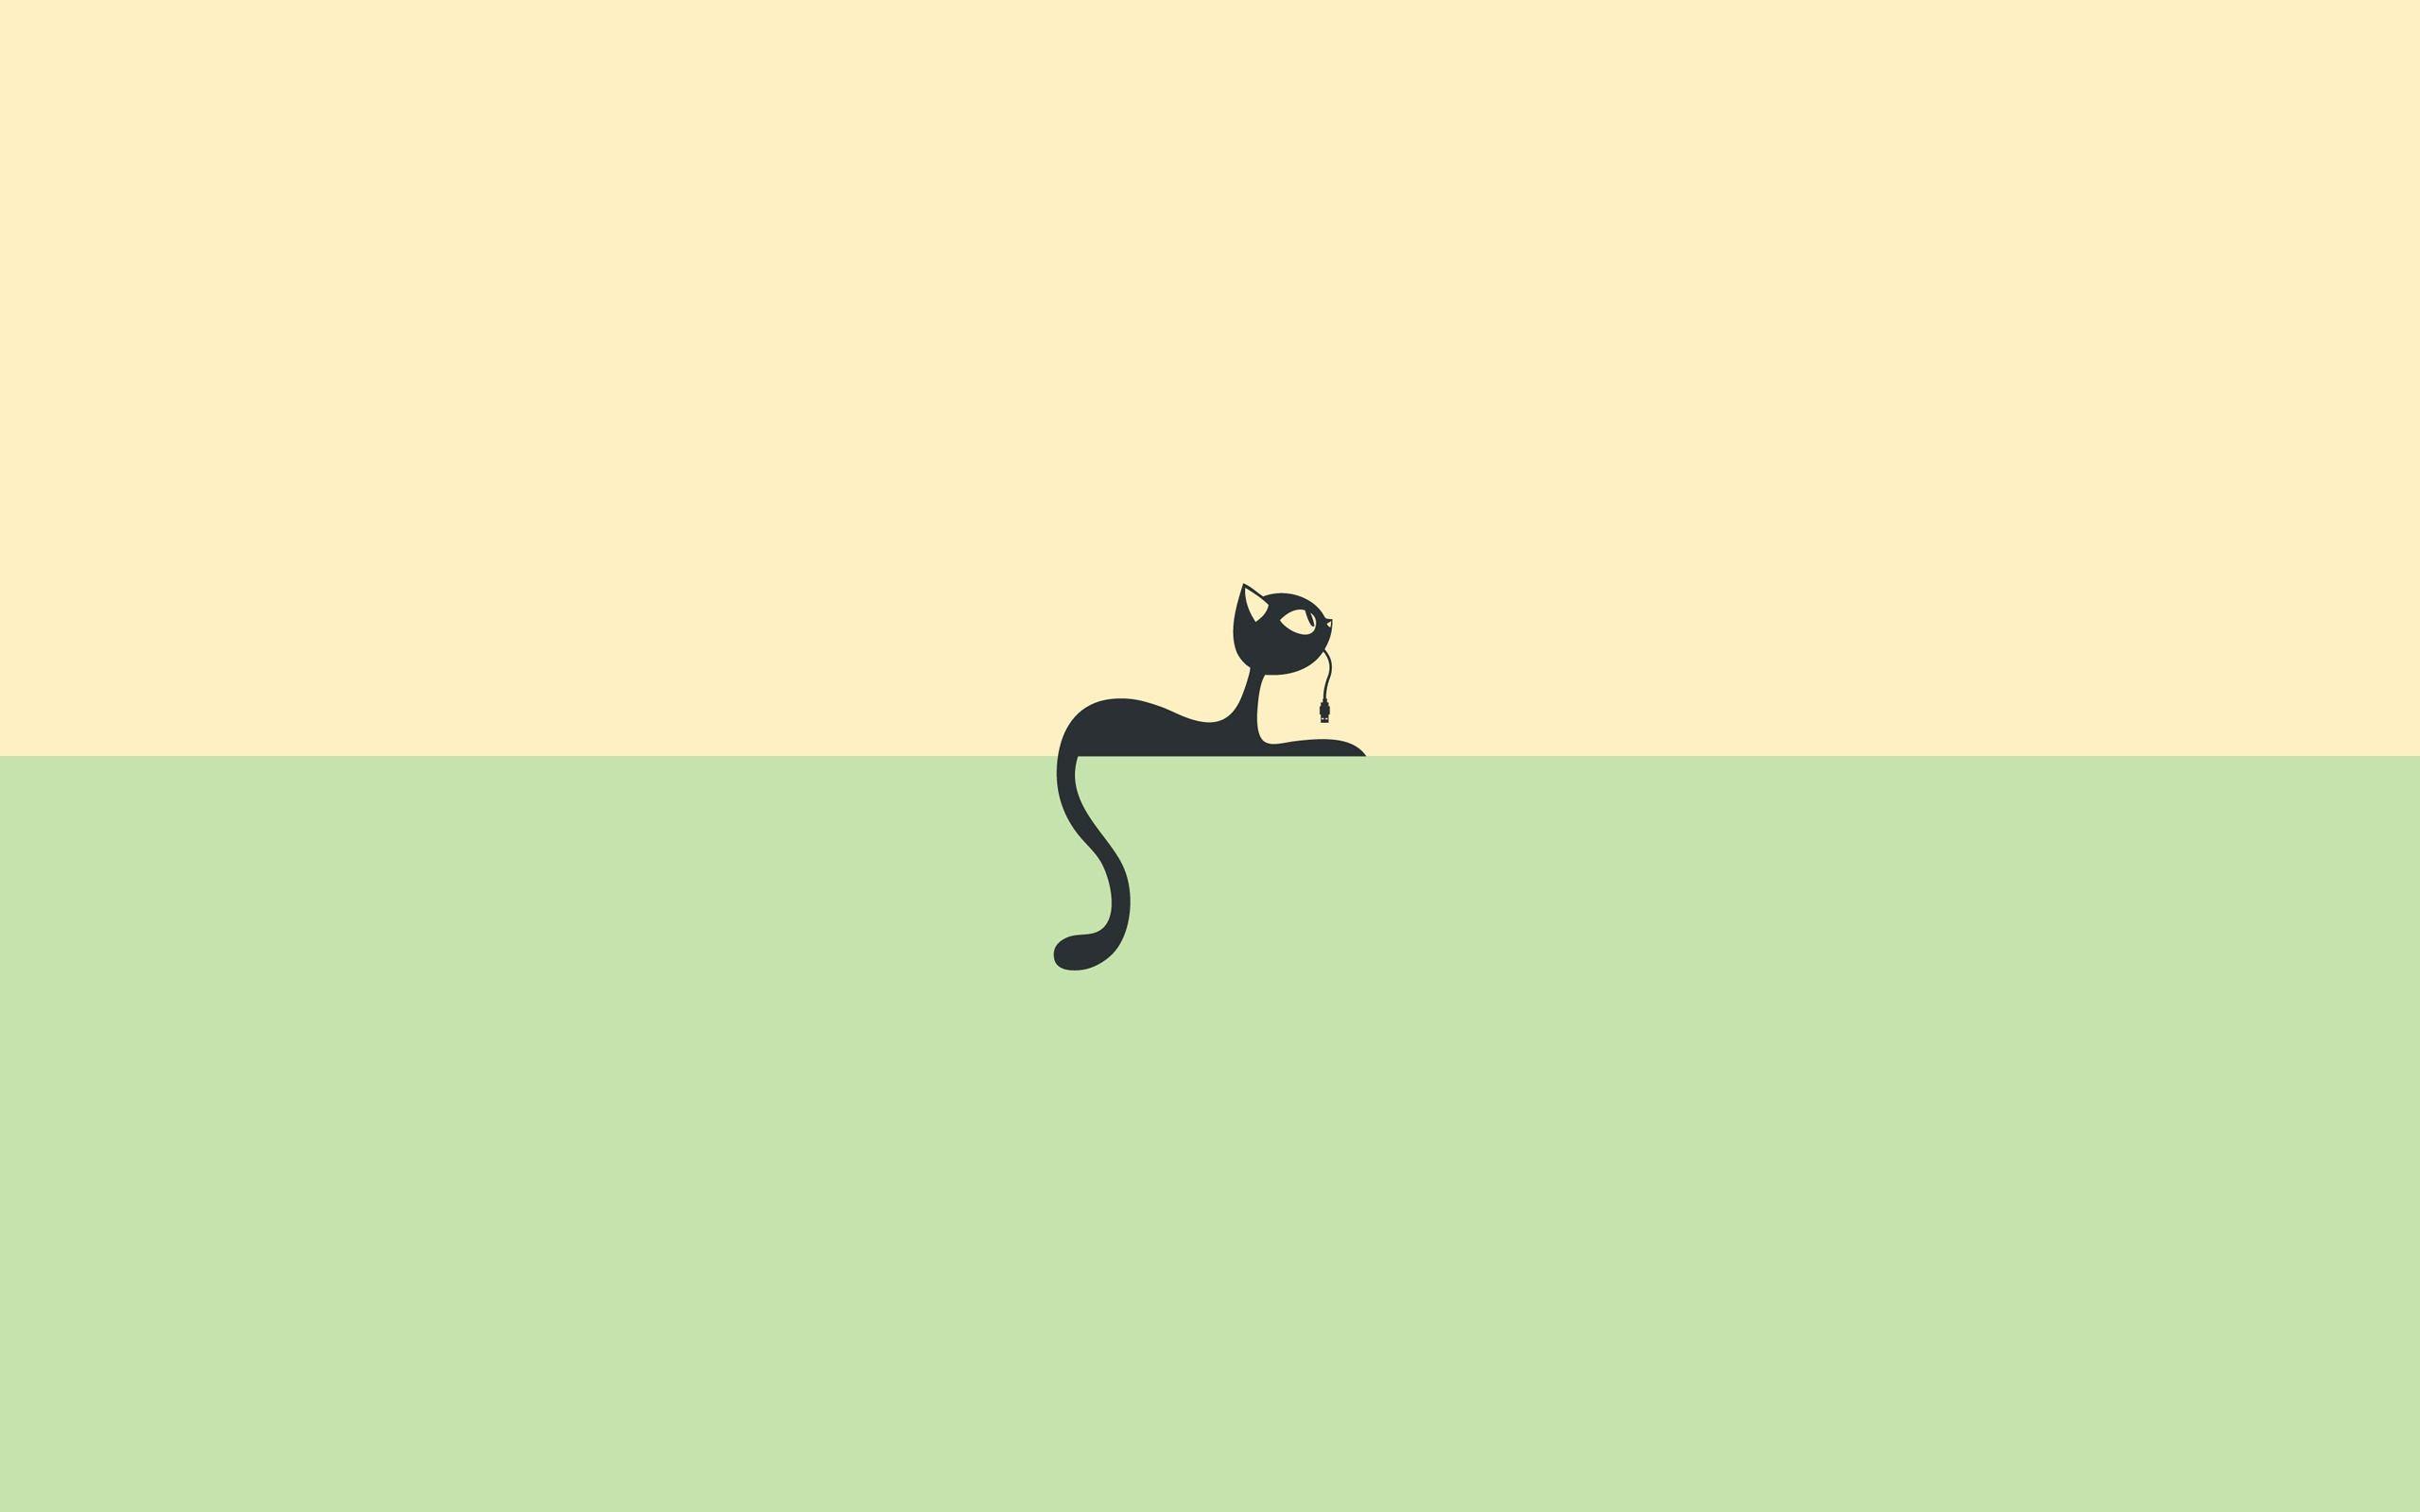 pin Drawn wallpaper cute animated animal #6